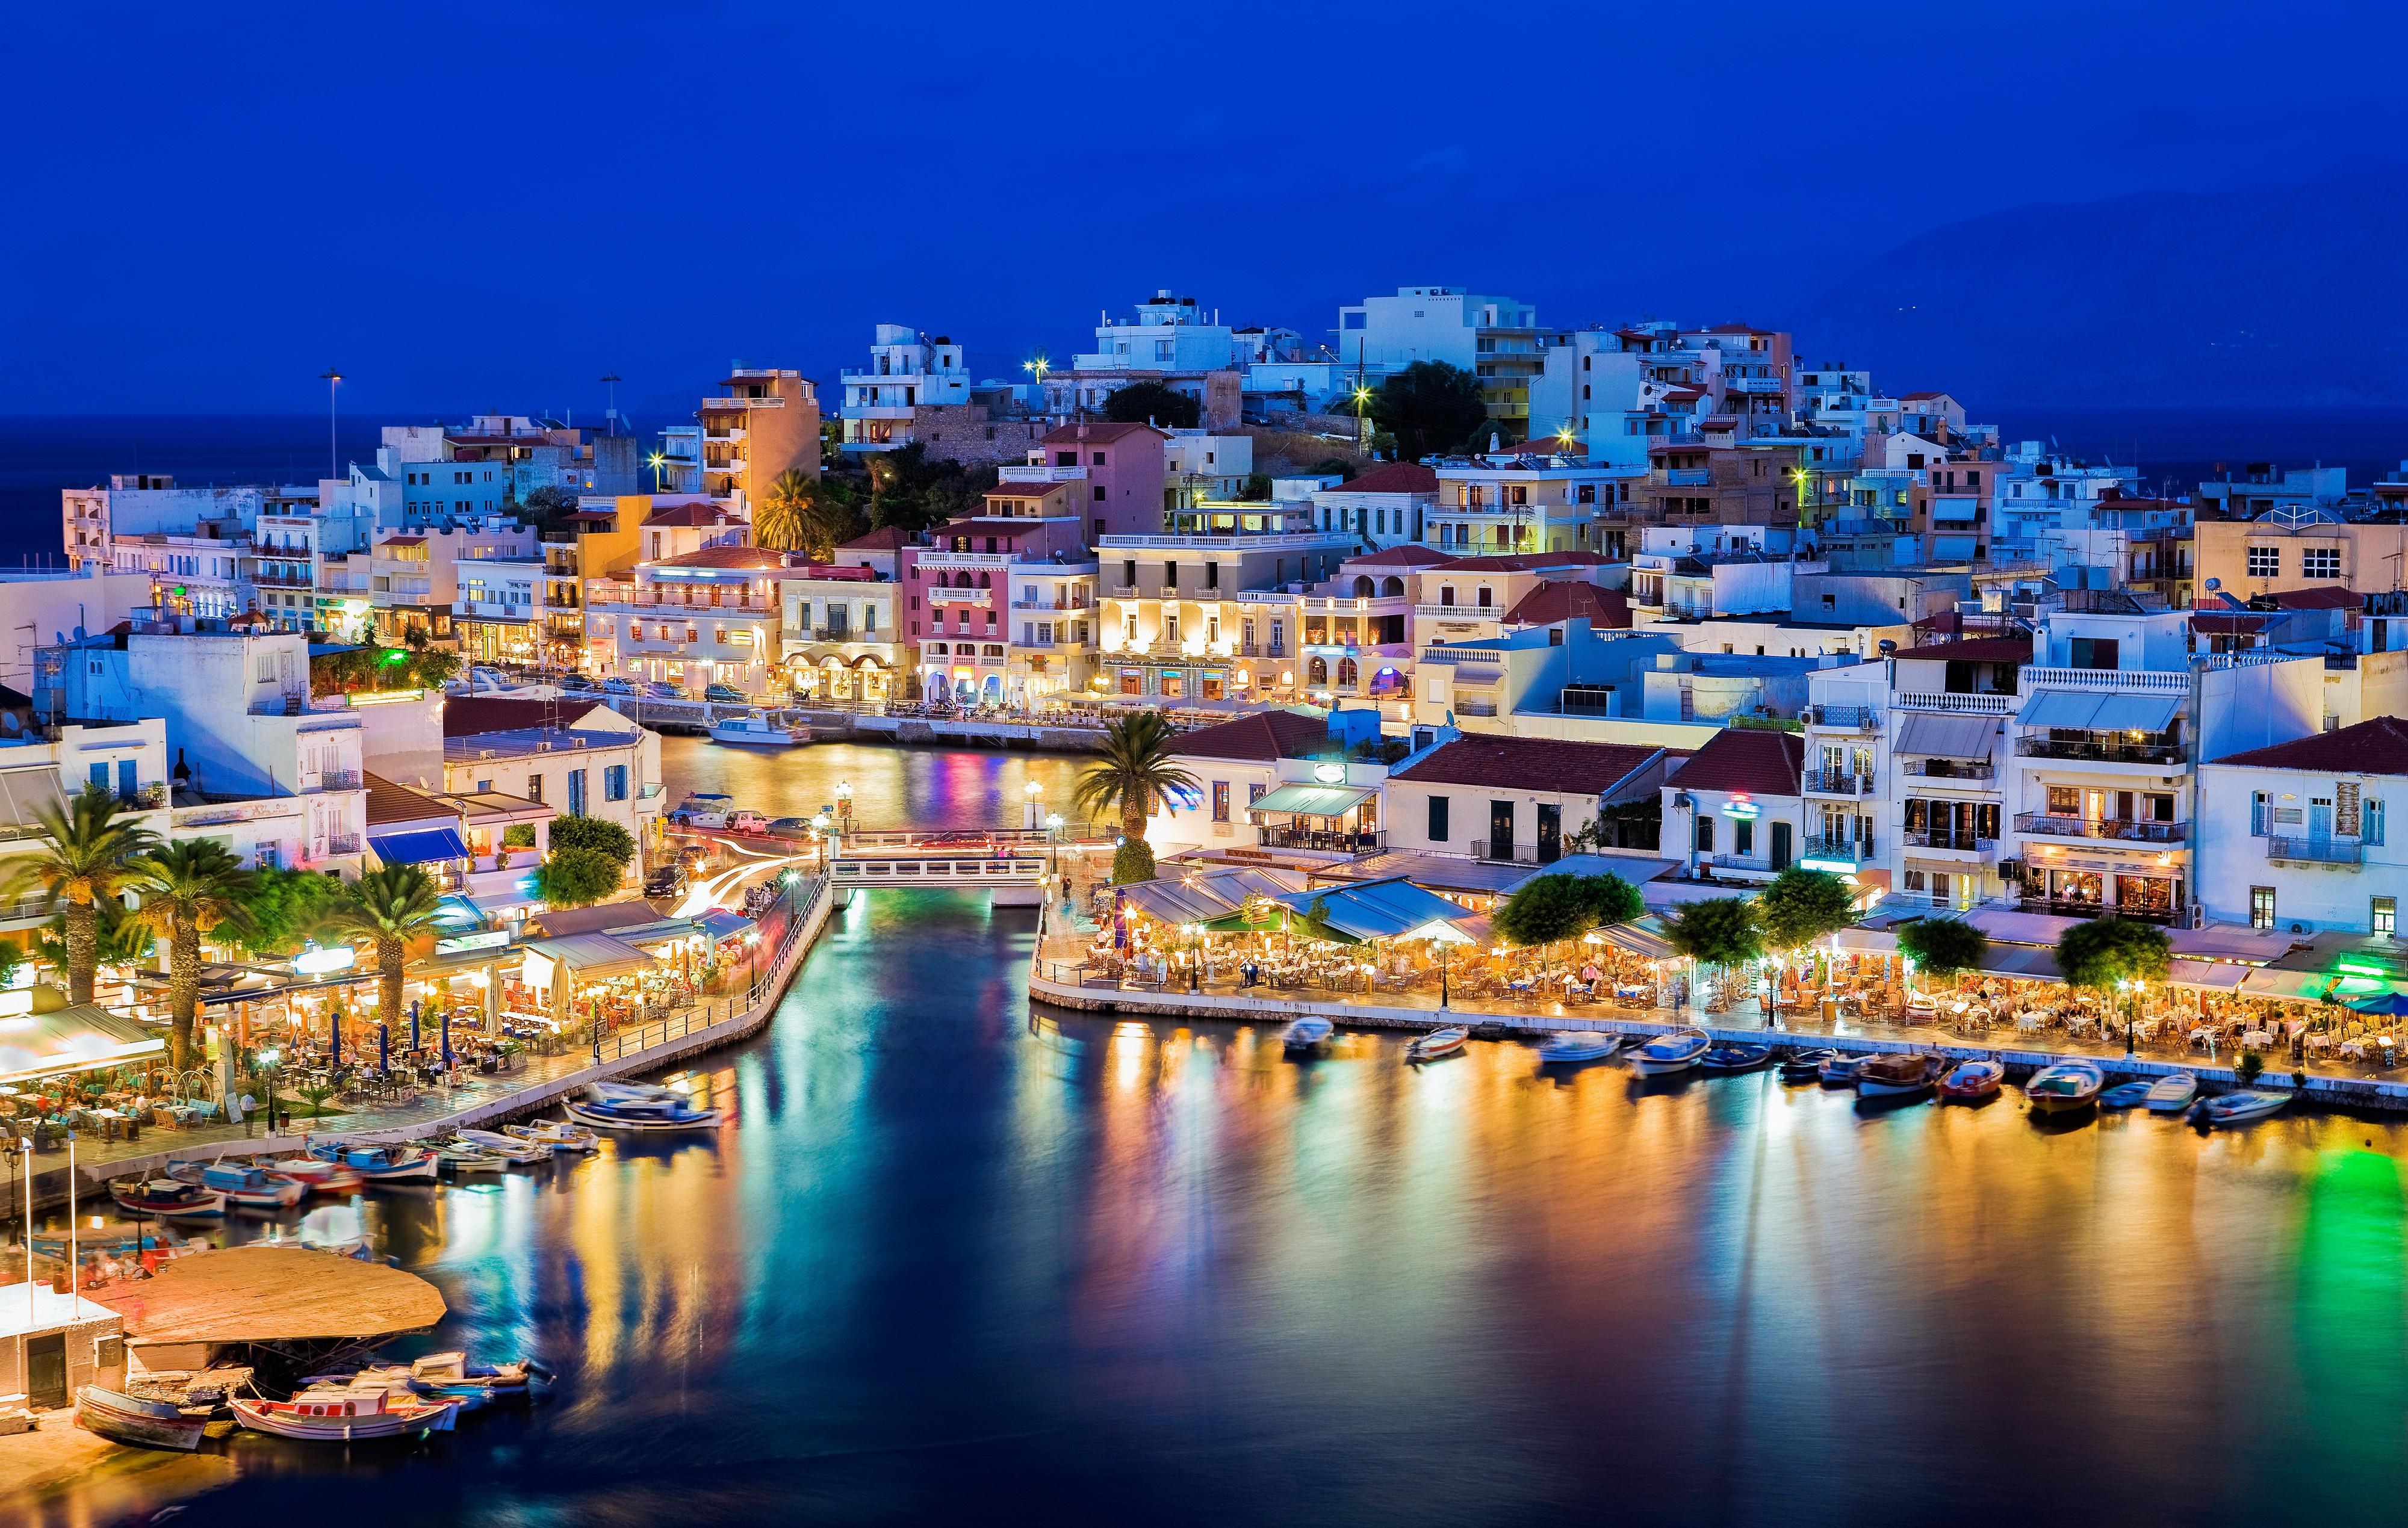 Crete Greece 4k Ultra HD Wallpaper Background Image 4000x2539 4000x2539